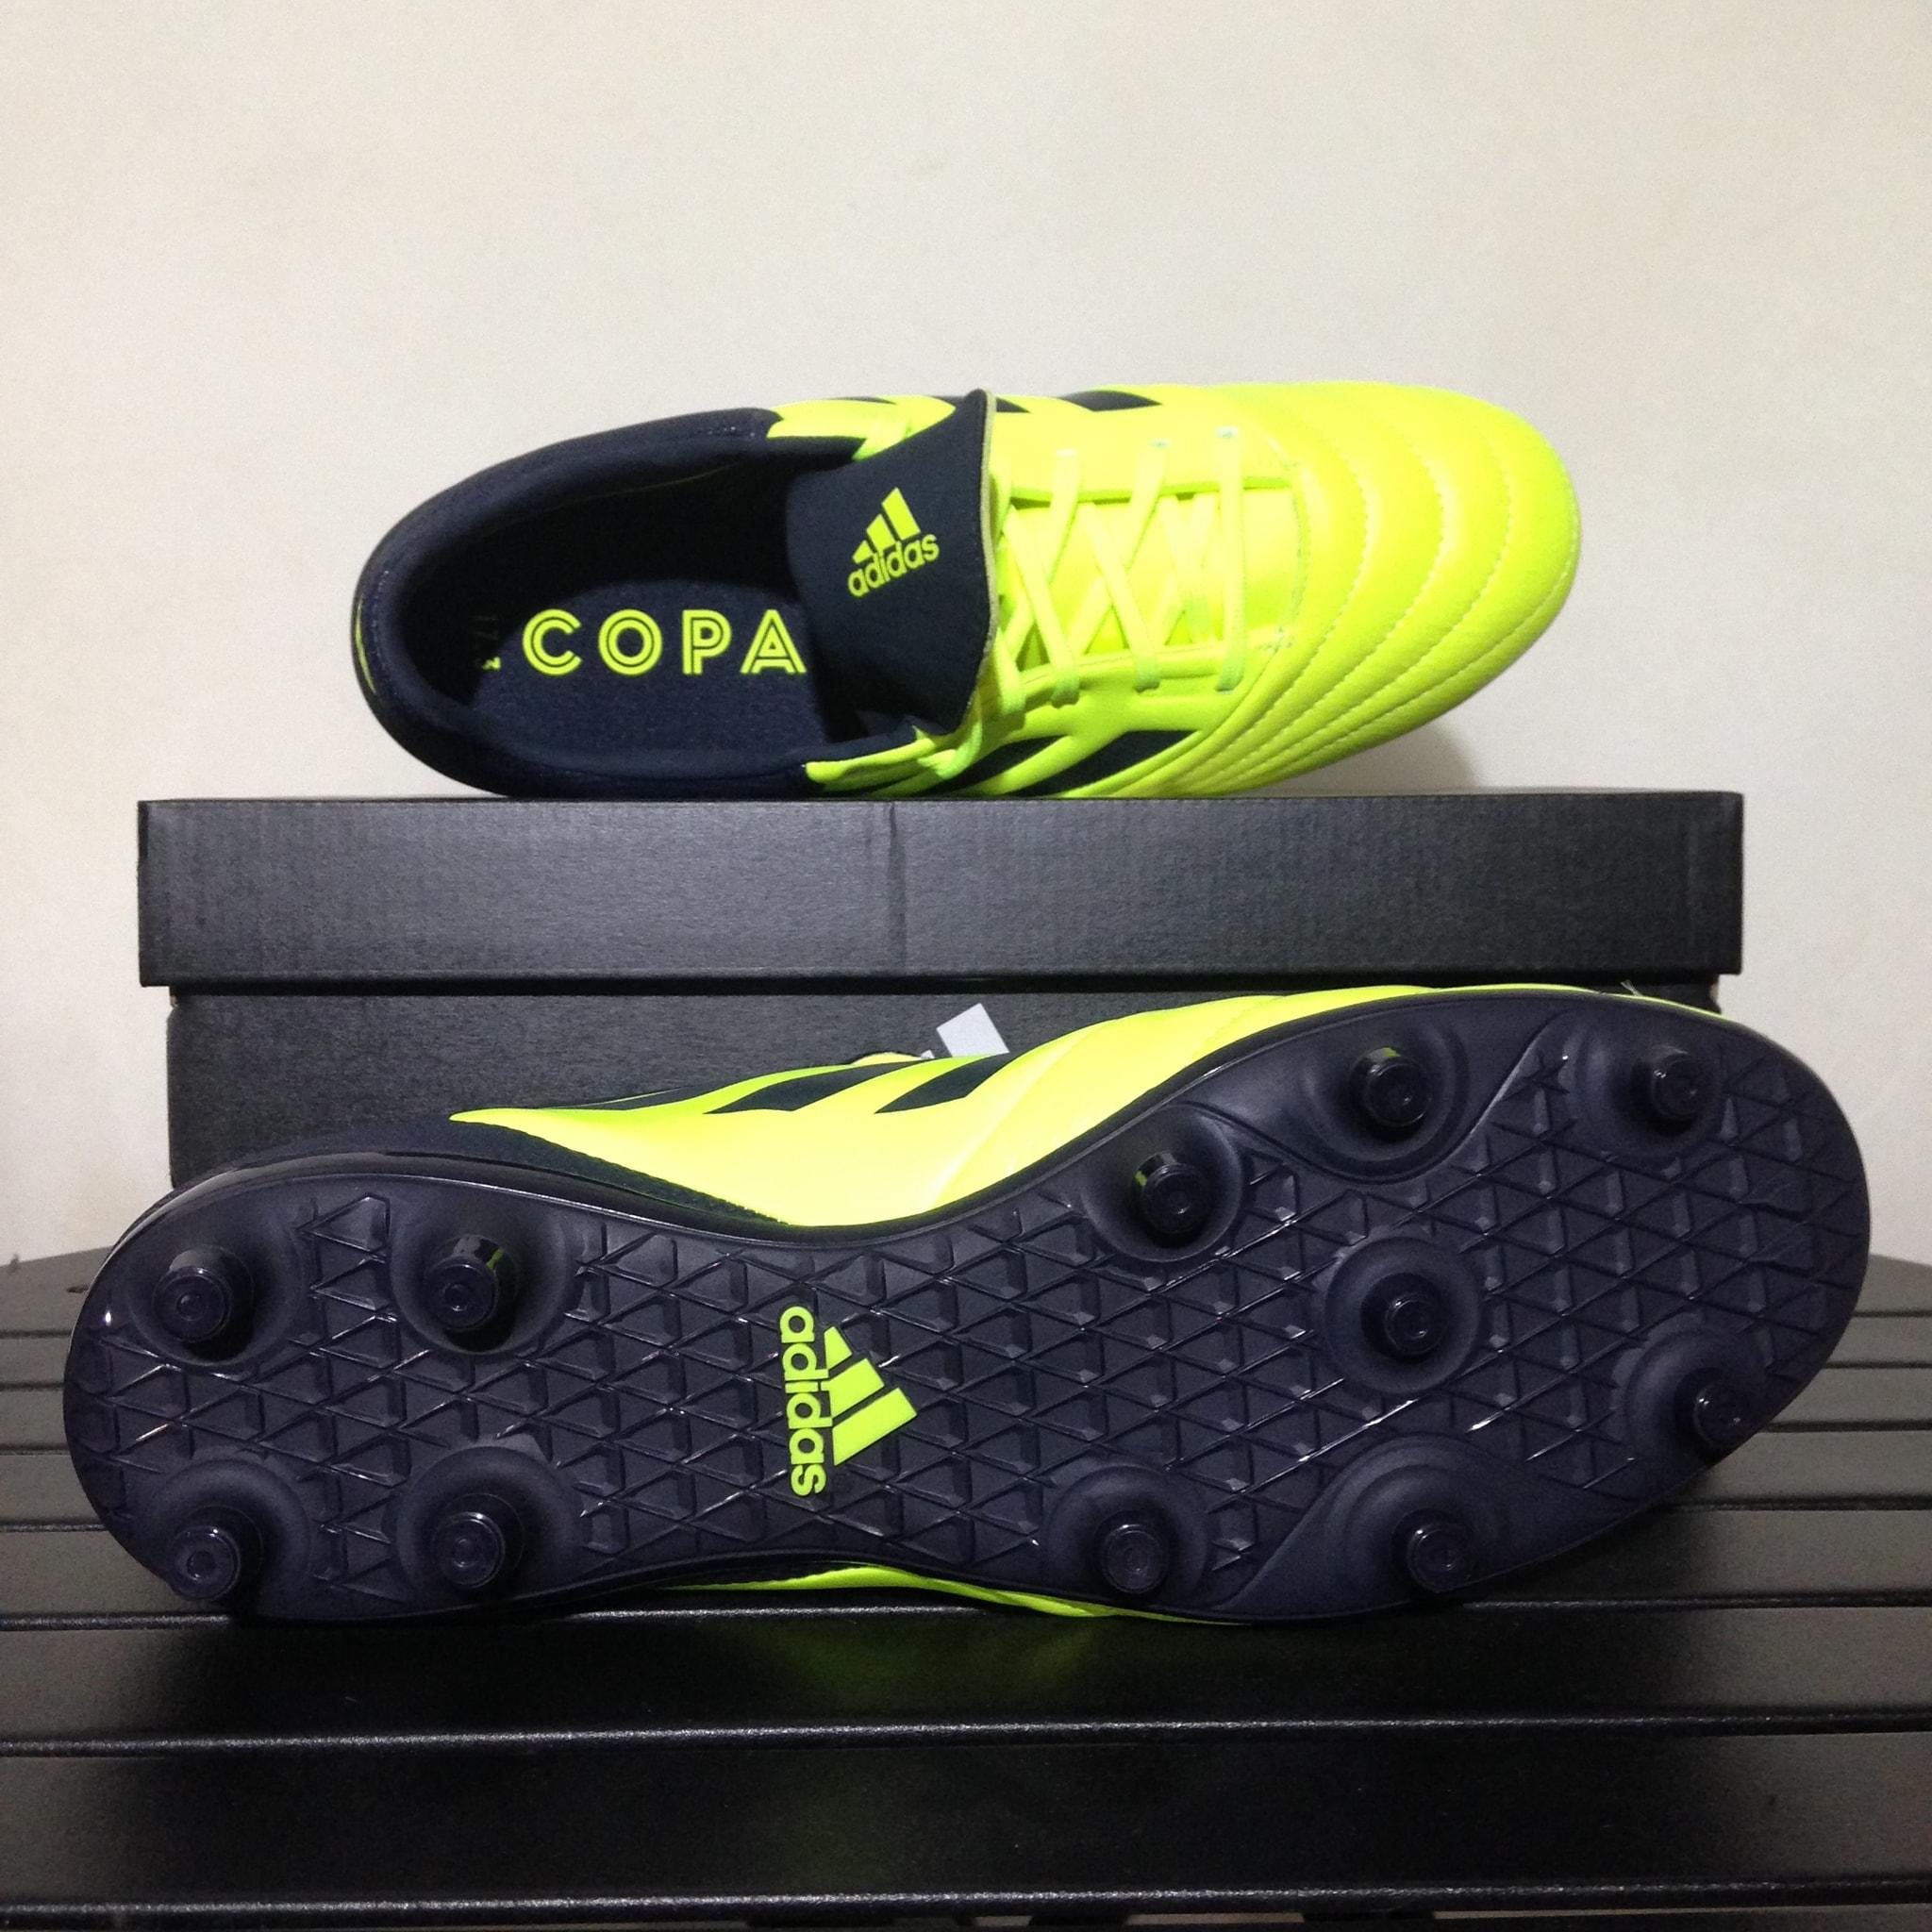 Jual Sepatu Bola Adidas Copa 173 Fg Solar Yellow Black S77143 Grade Ori Original